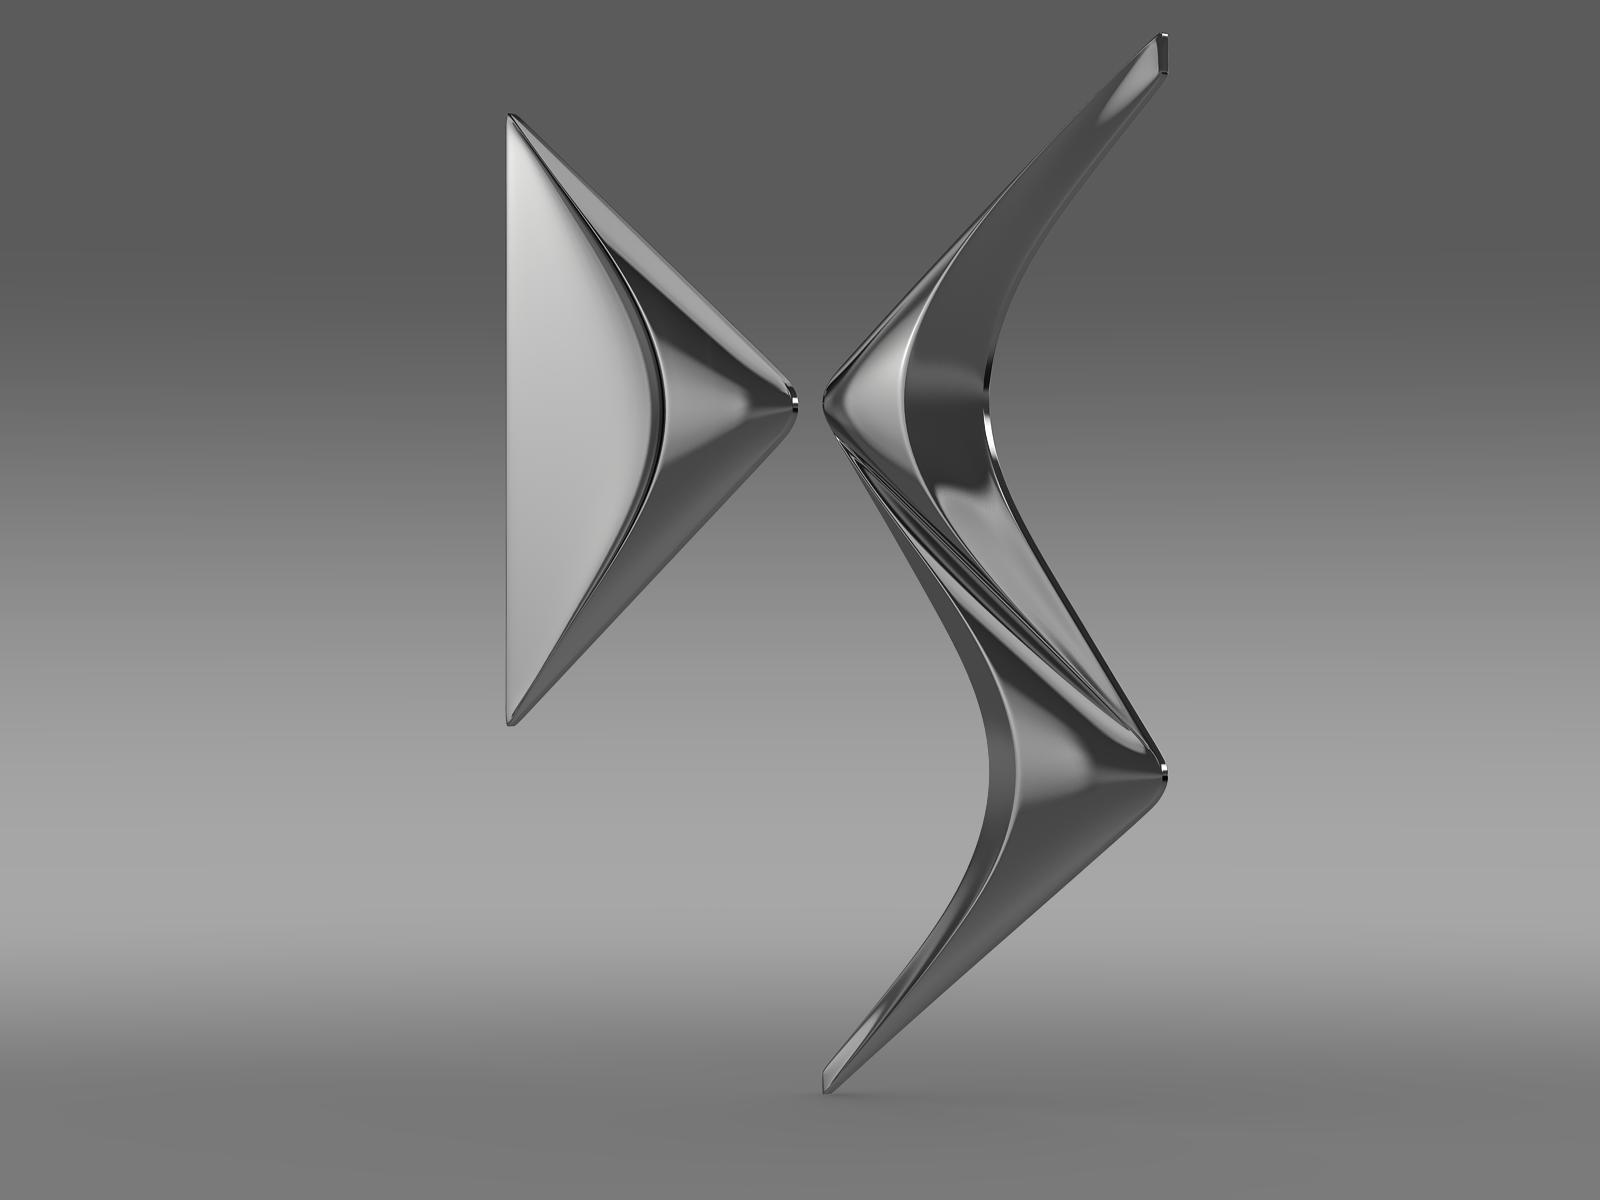 ds logo 3d model 3ds max fbx c4d lwo ma mb hrc xsi obj 162828